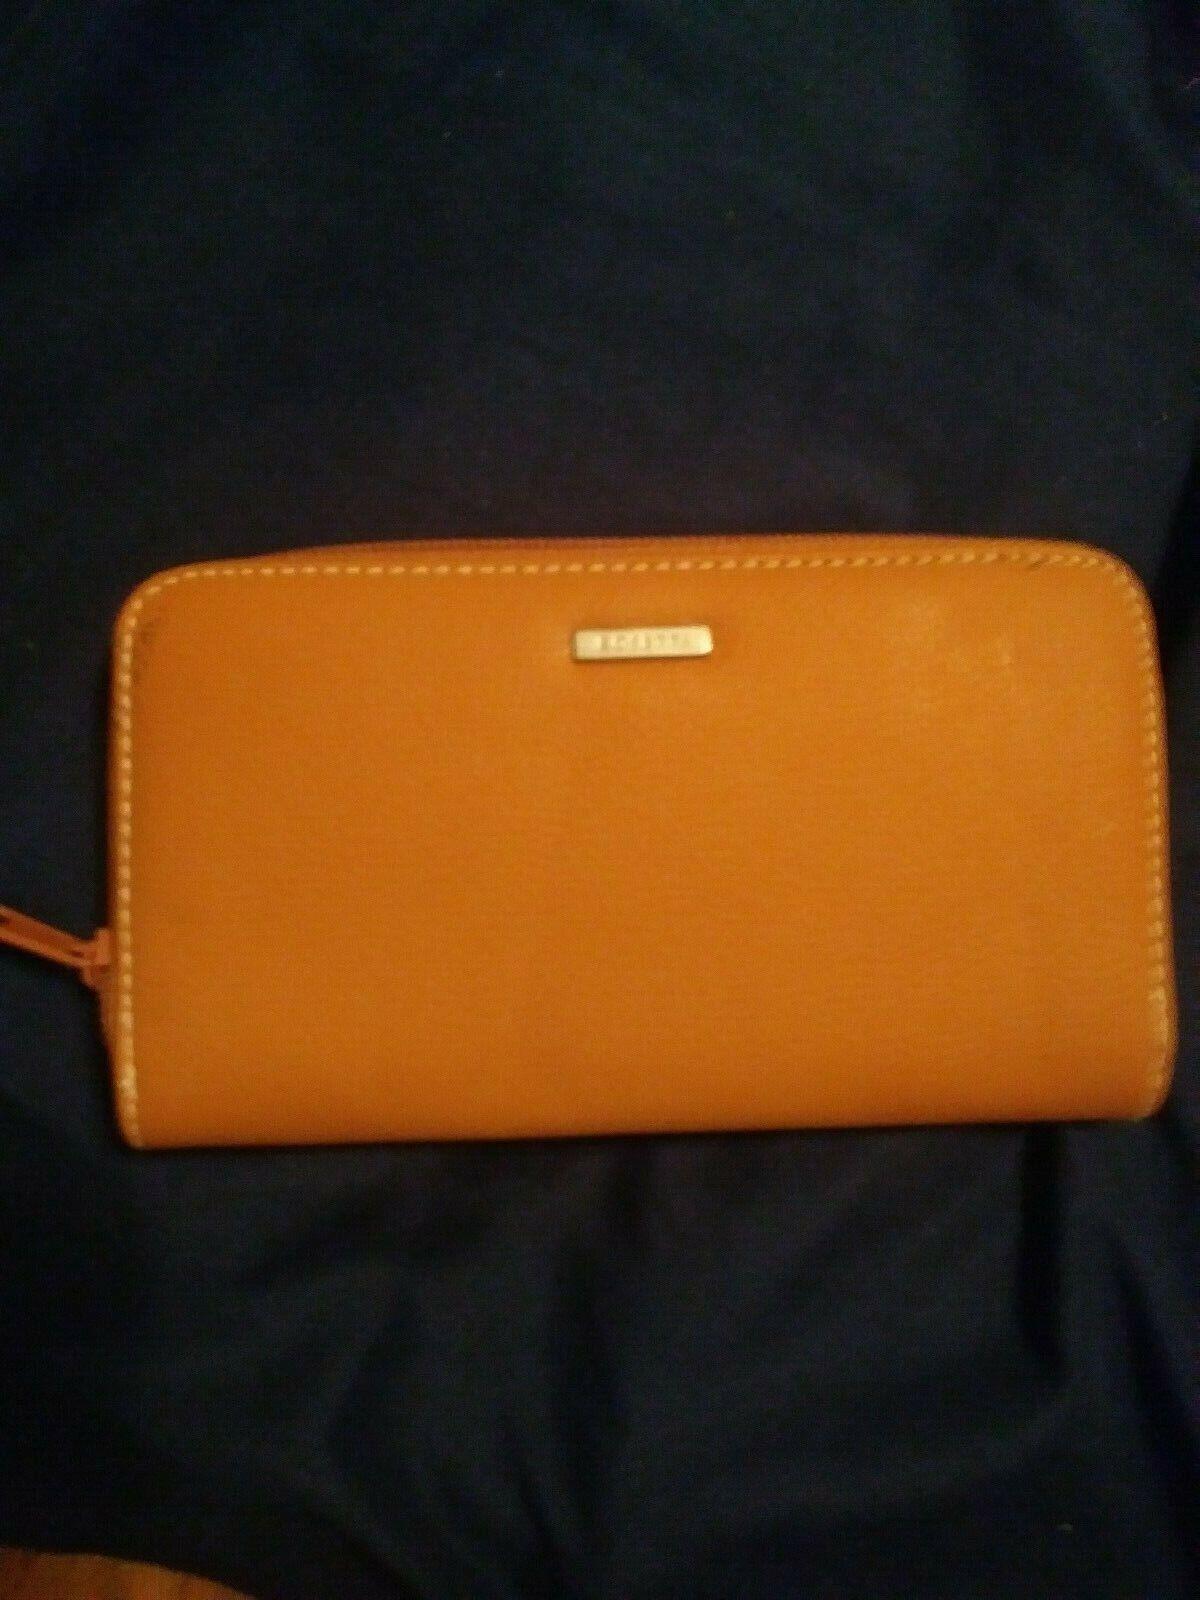 New Rosetti Wallet Many Compartments Zipper Closure Tan Color